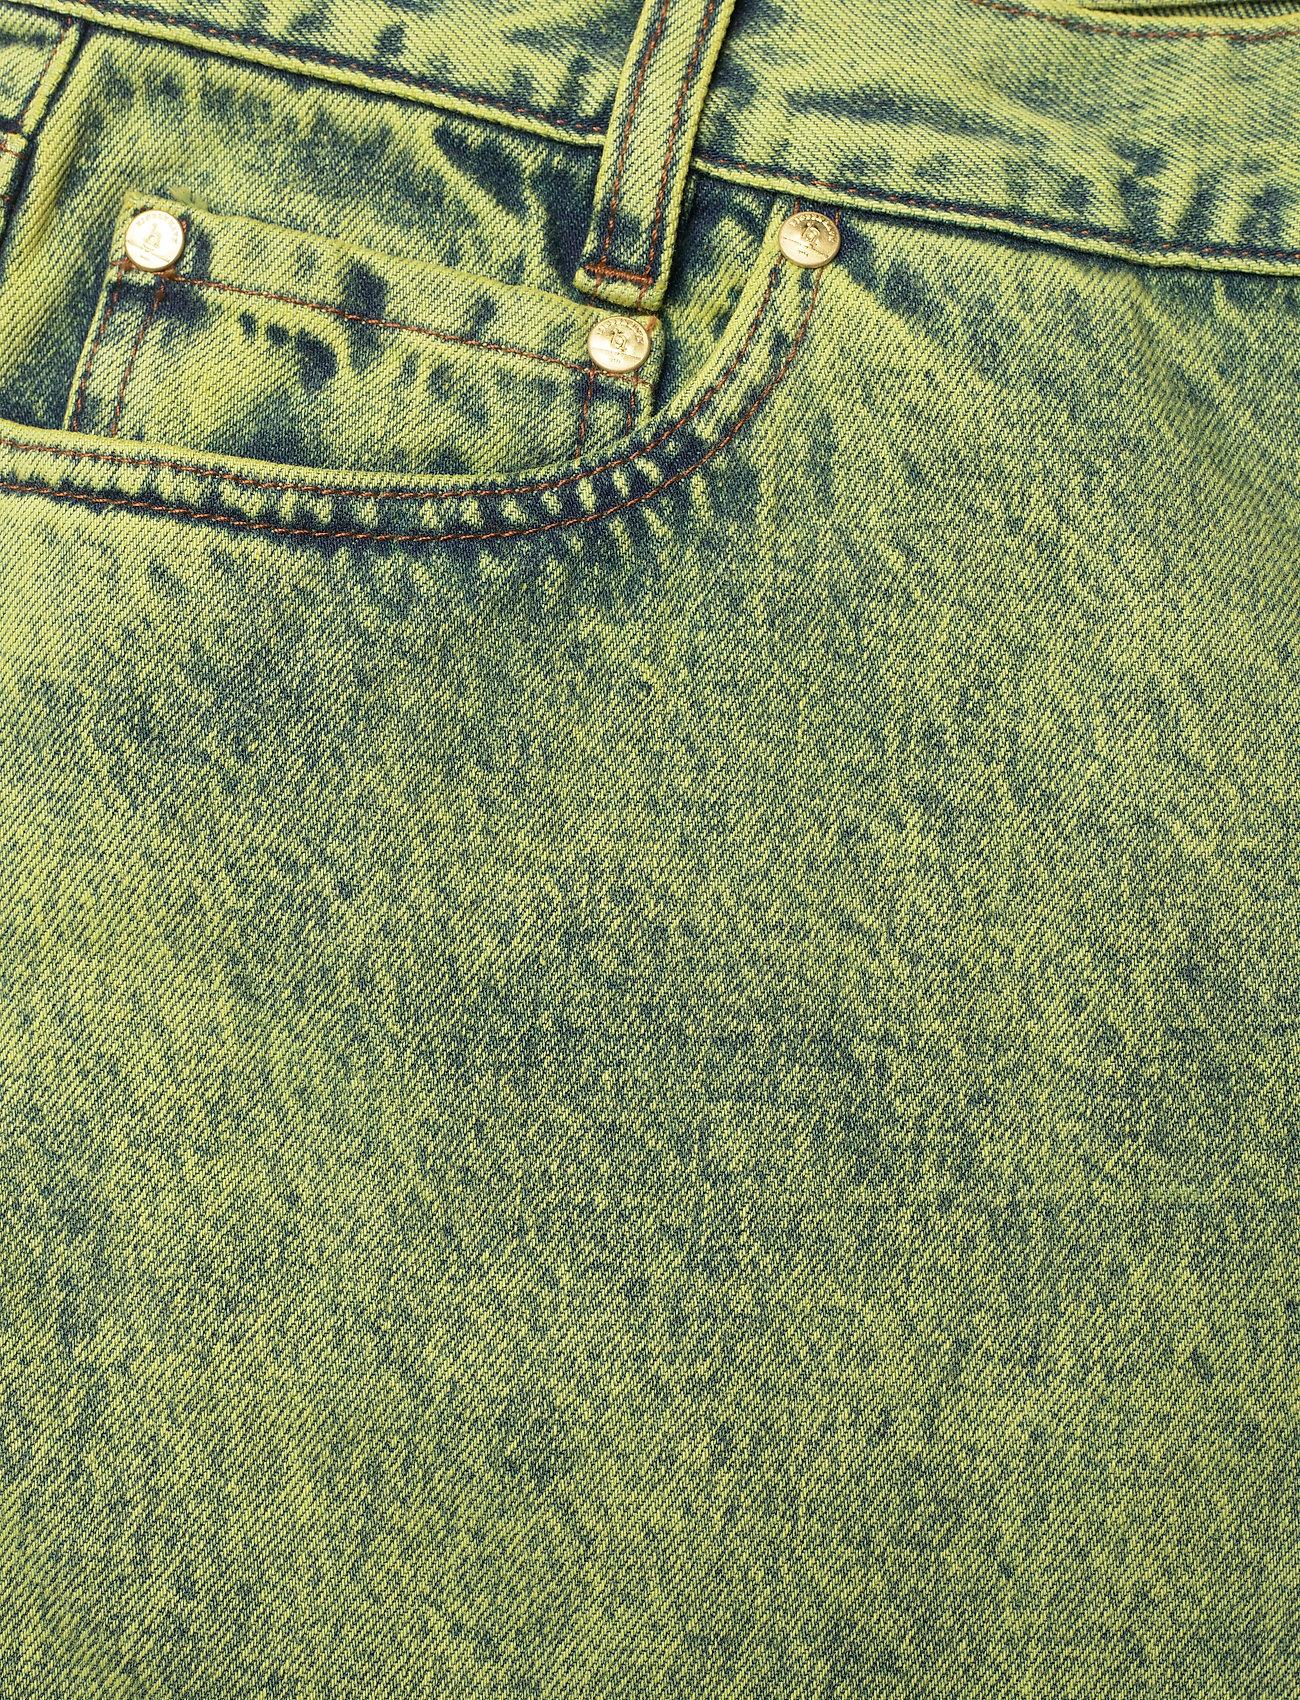 HAN Kjøbenhavn - Denim Jeans - slim jeans - lime - 2